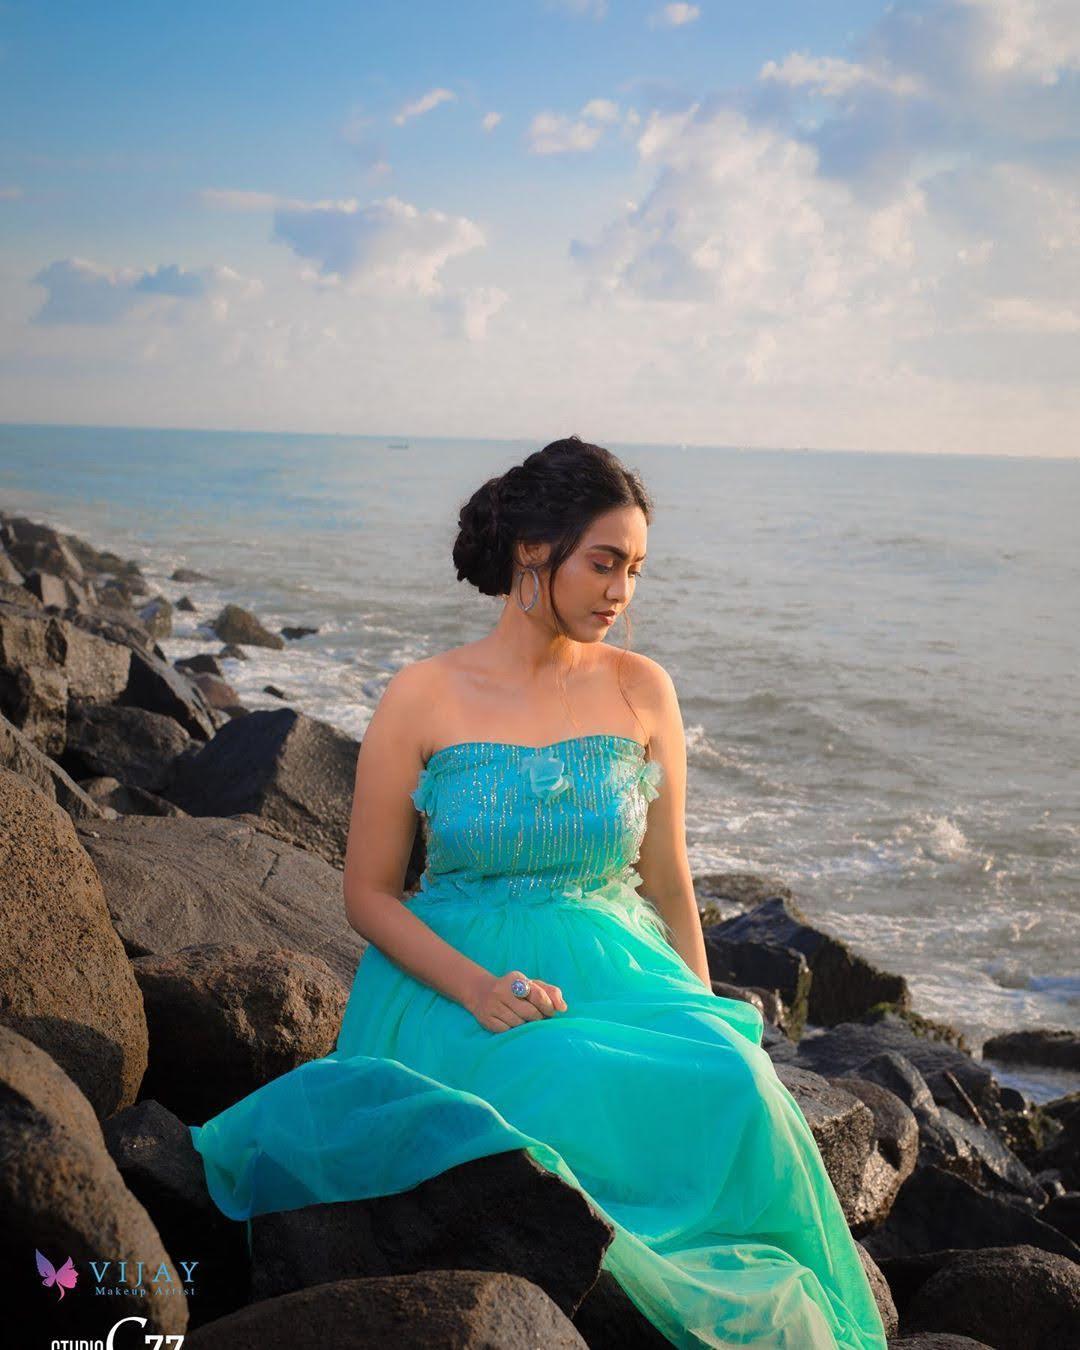 pavithra-janani-64689